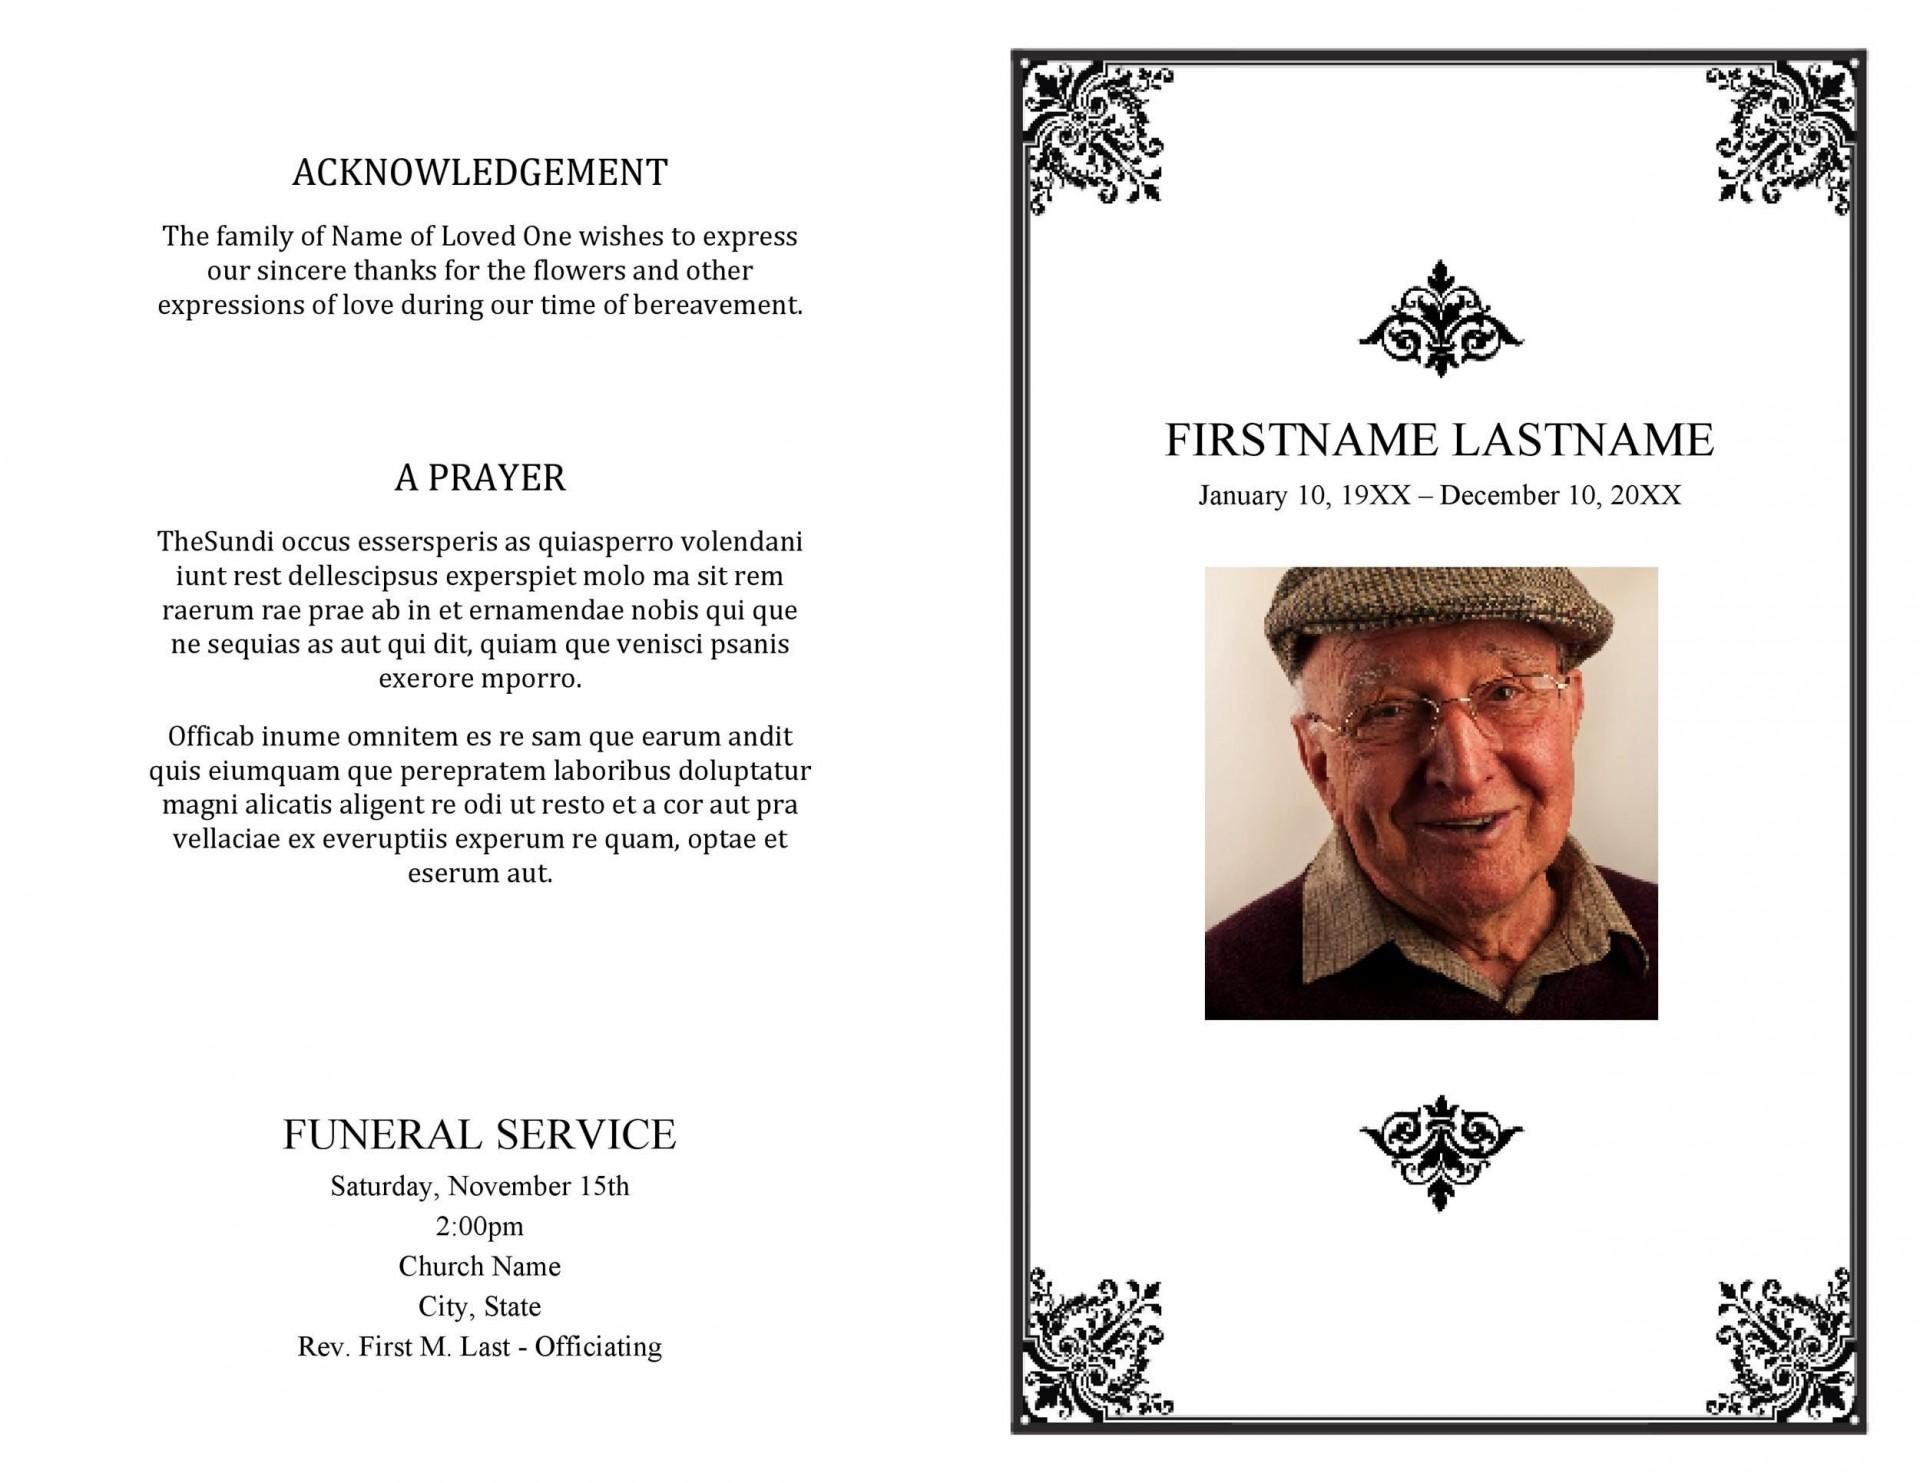 005 Incredible Free Funeral Program Template Word Concept  Microsoft 2010 Tri Fold1920